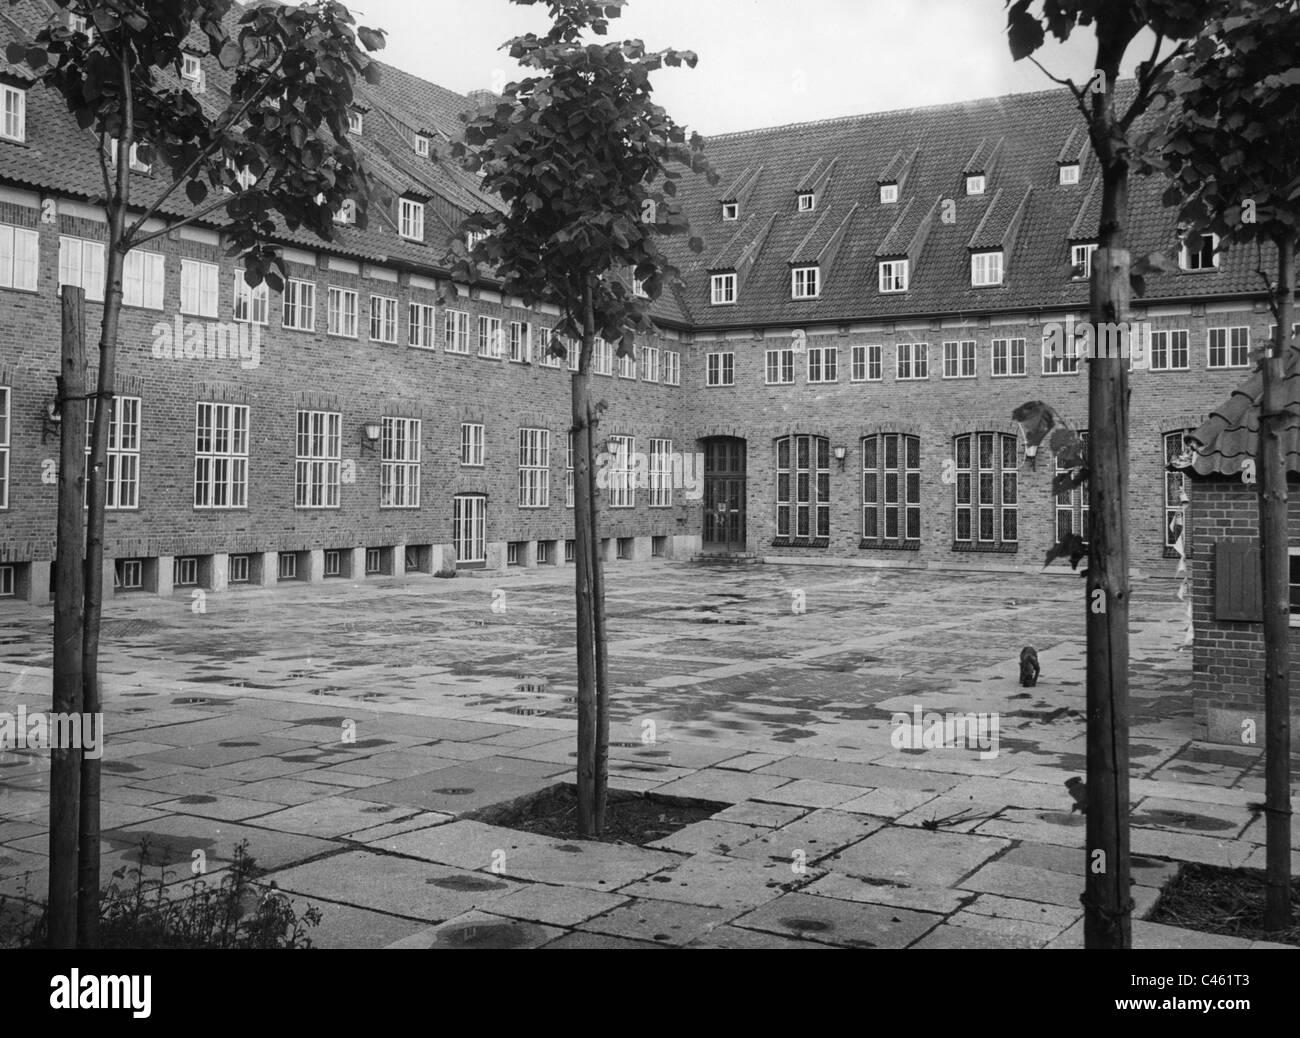 Politics buildings europe 1933 1938 stockfotos politics for Architektur 3 reich